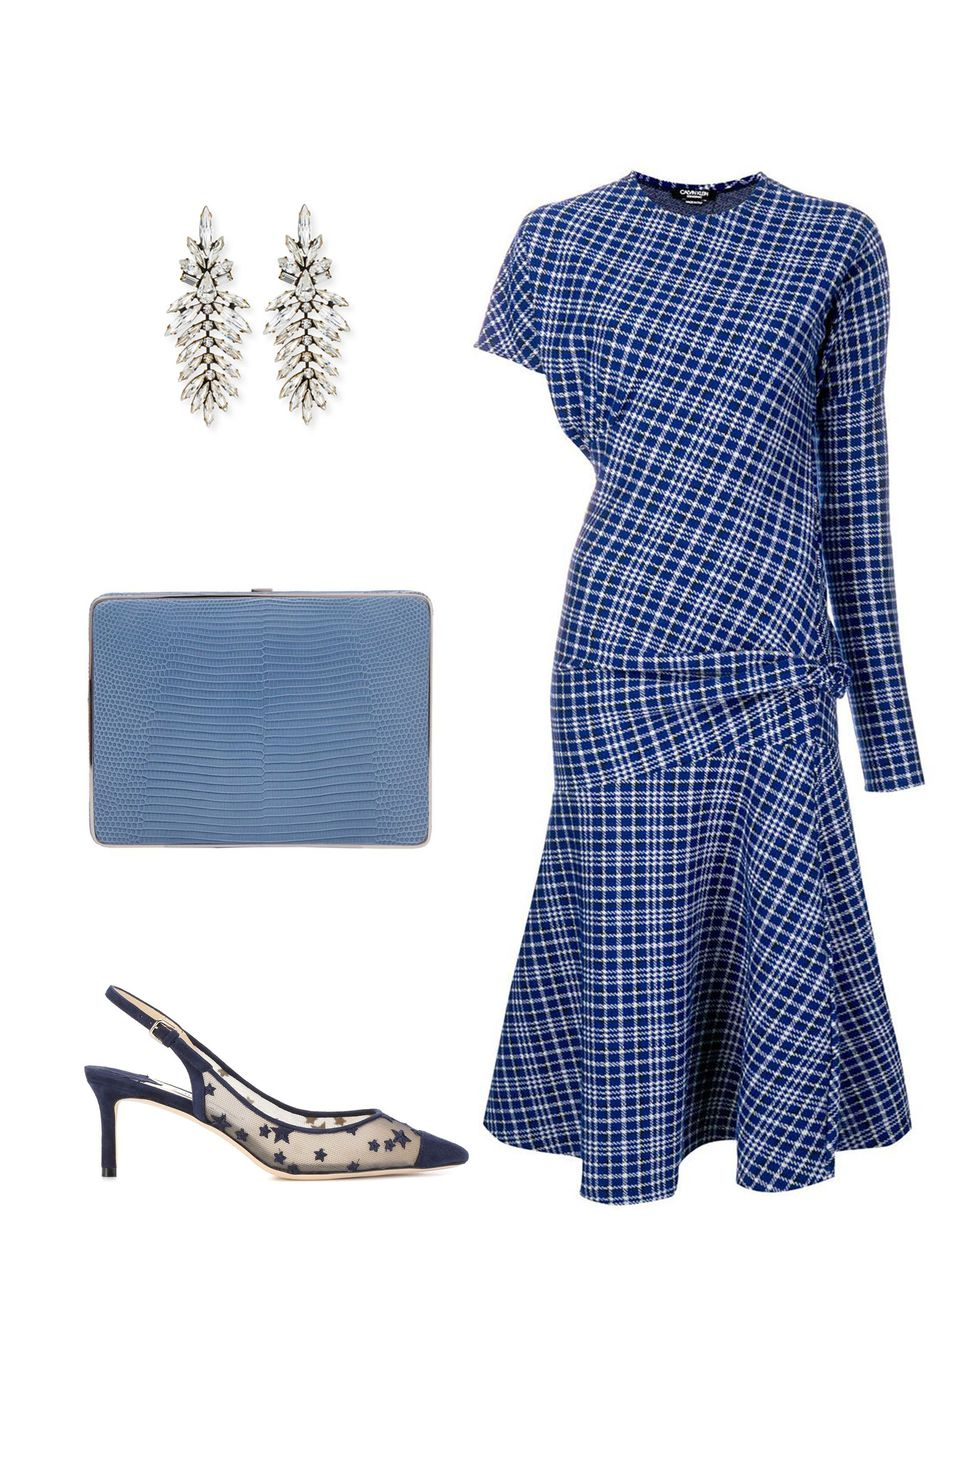 what-to-wear-for-a-fall-wedding-guest-outfit-autumn-tartan-print-plaid-blue-navy-dress-aline-earrings-blue-bag-clutch-blue-shoe-pumps-dinner.jpg